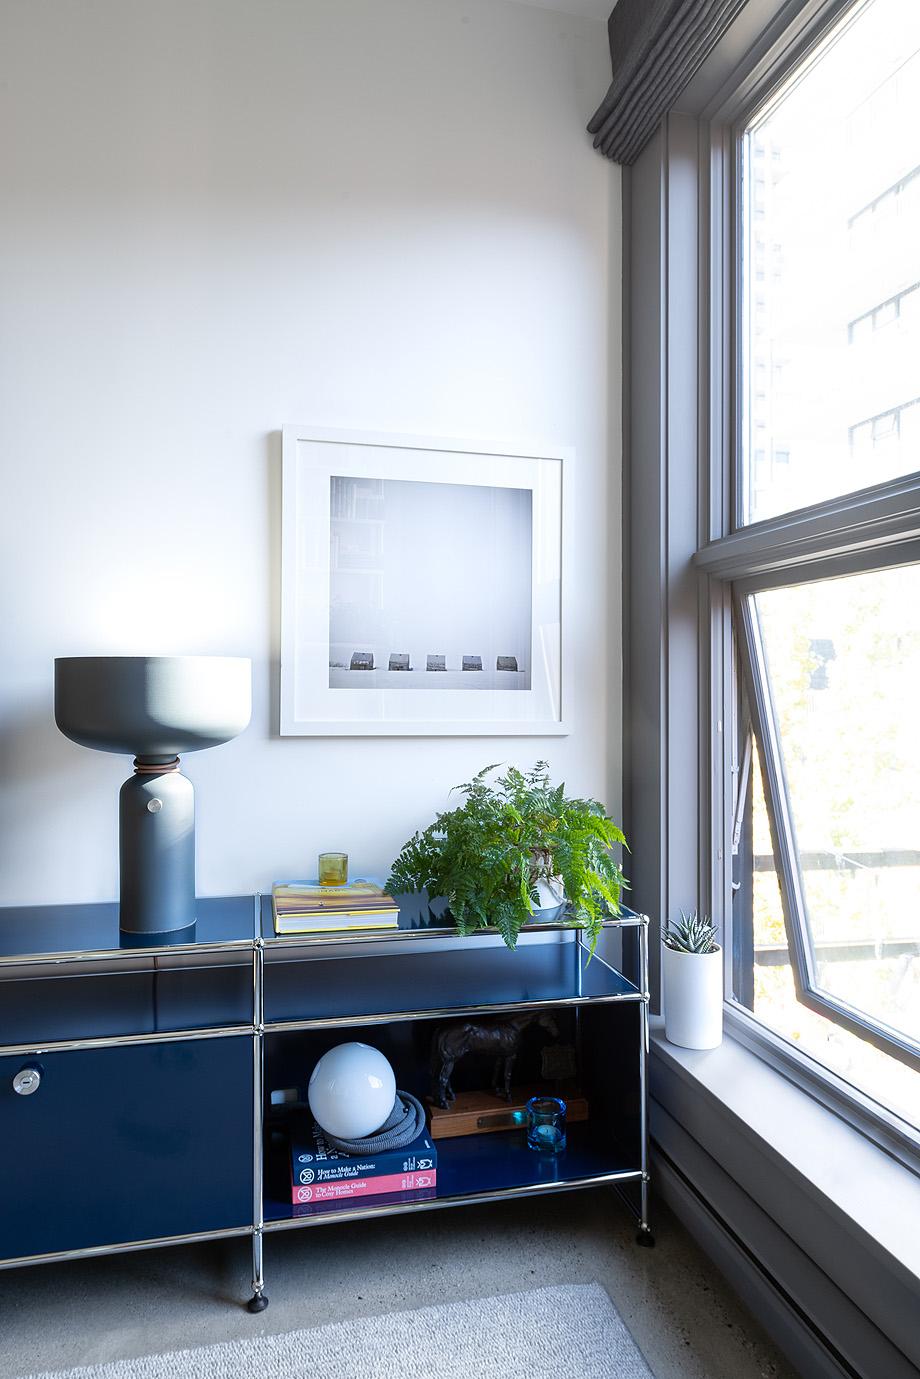 vivienda en vancouver de falken reynolds - foto chad falkenberg (9)